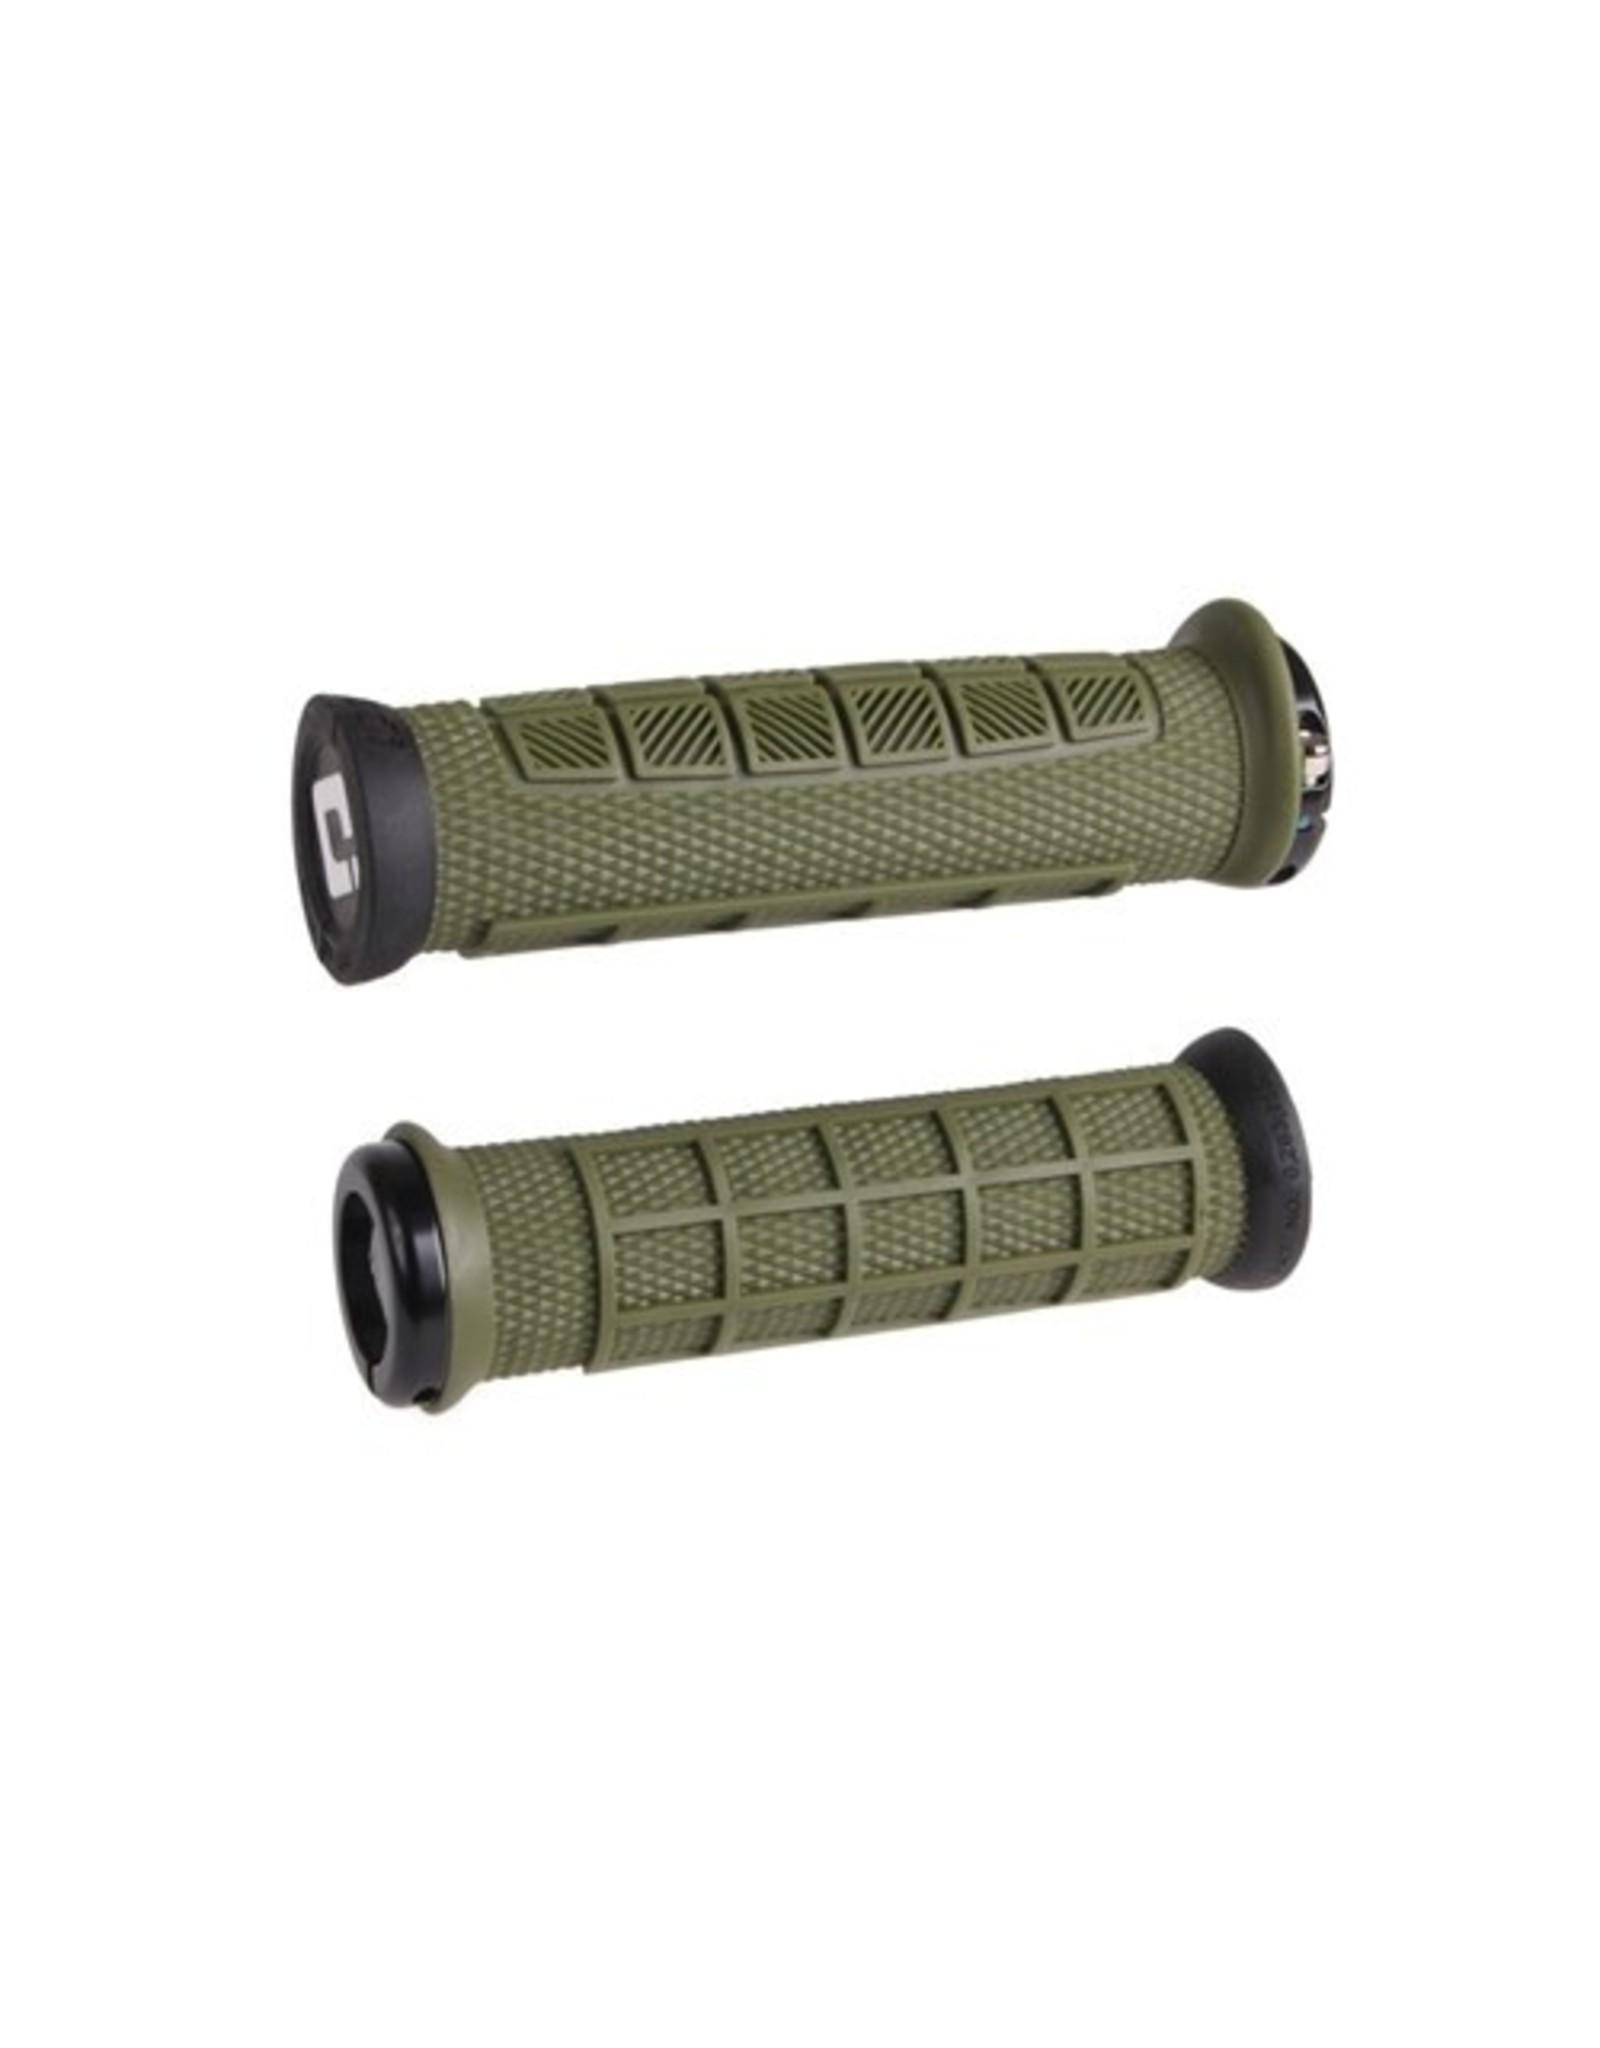 ODI ODI MTB ELITE PRO L/O ARMY GREEN 135MM V2.1